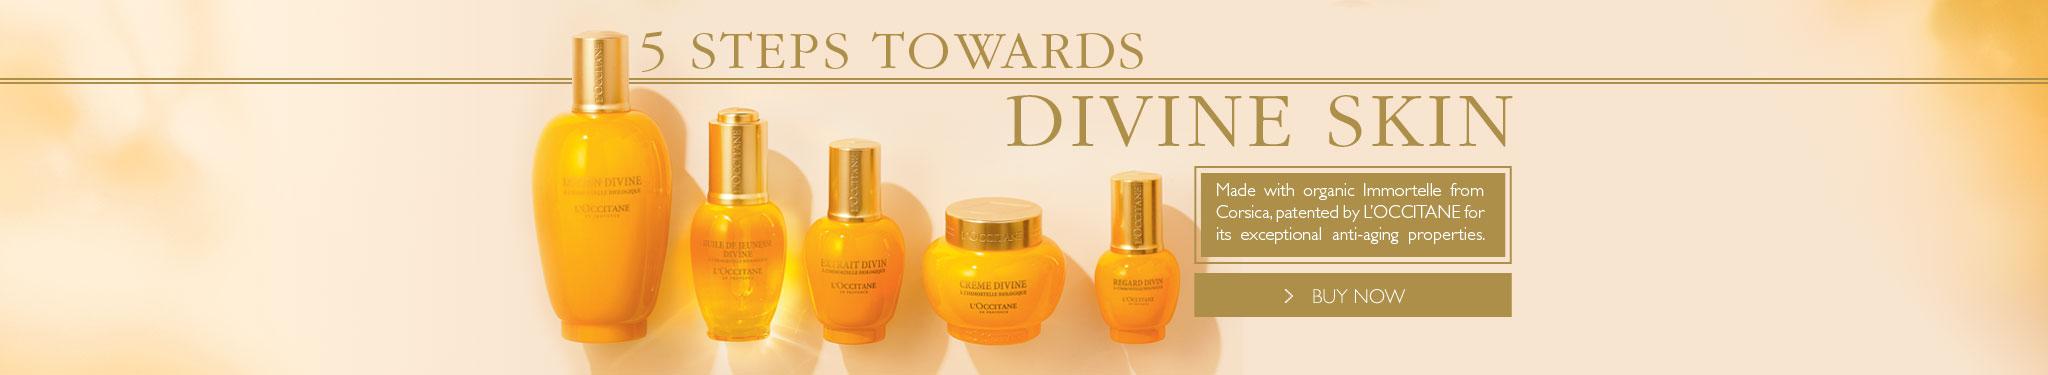 5 Steps Towards Divine Skin